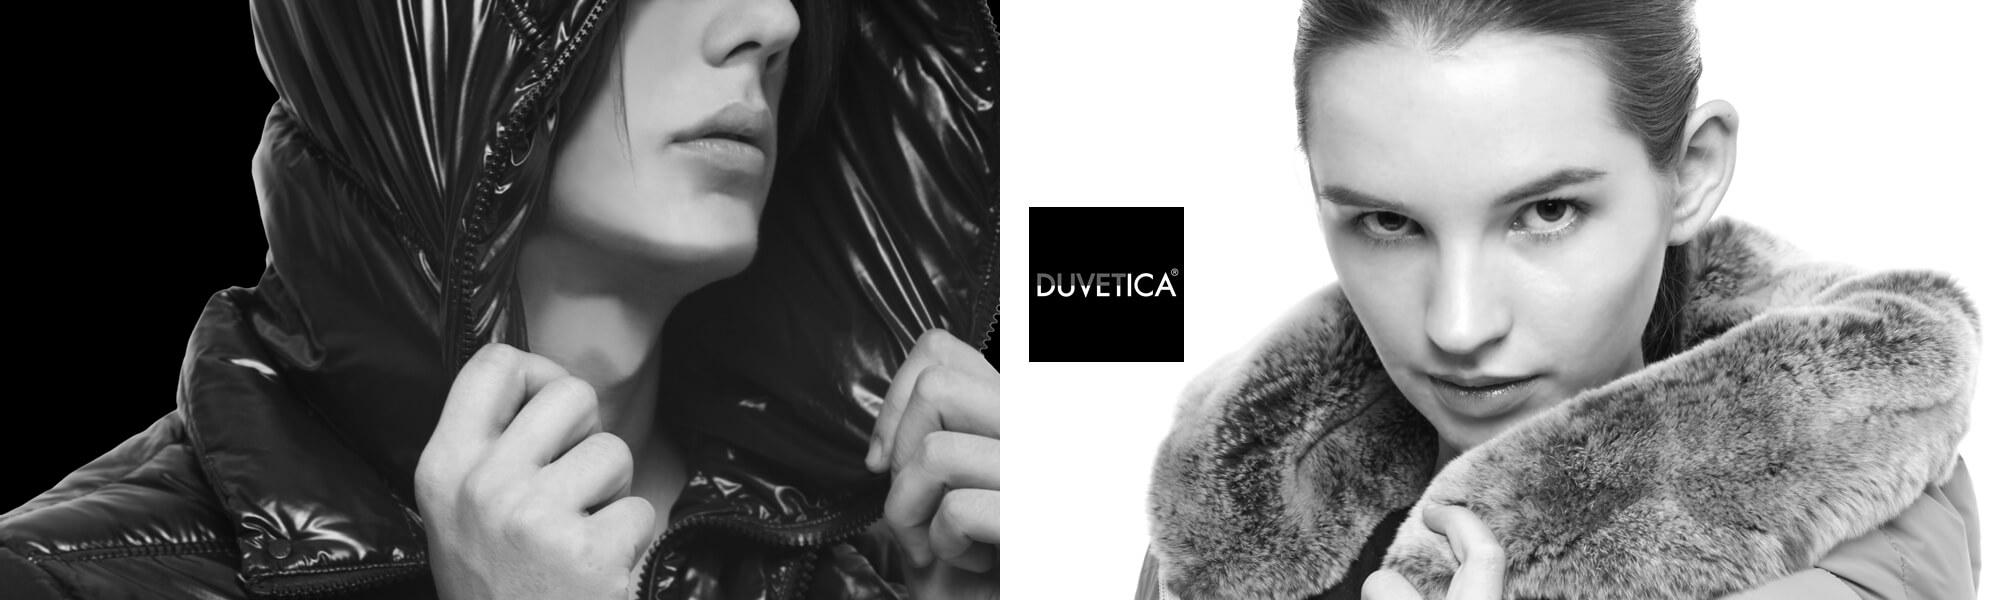 duvetica blog